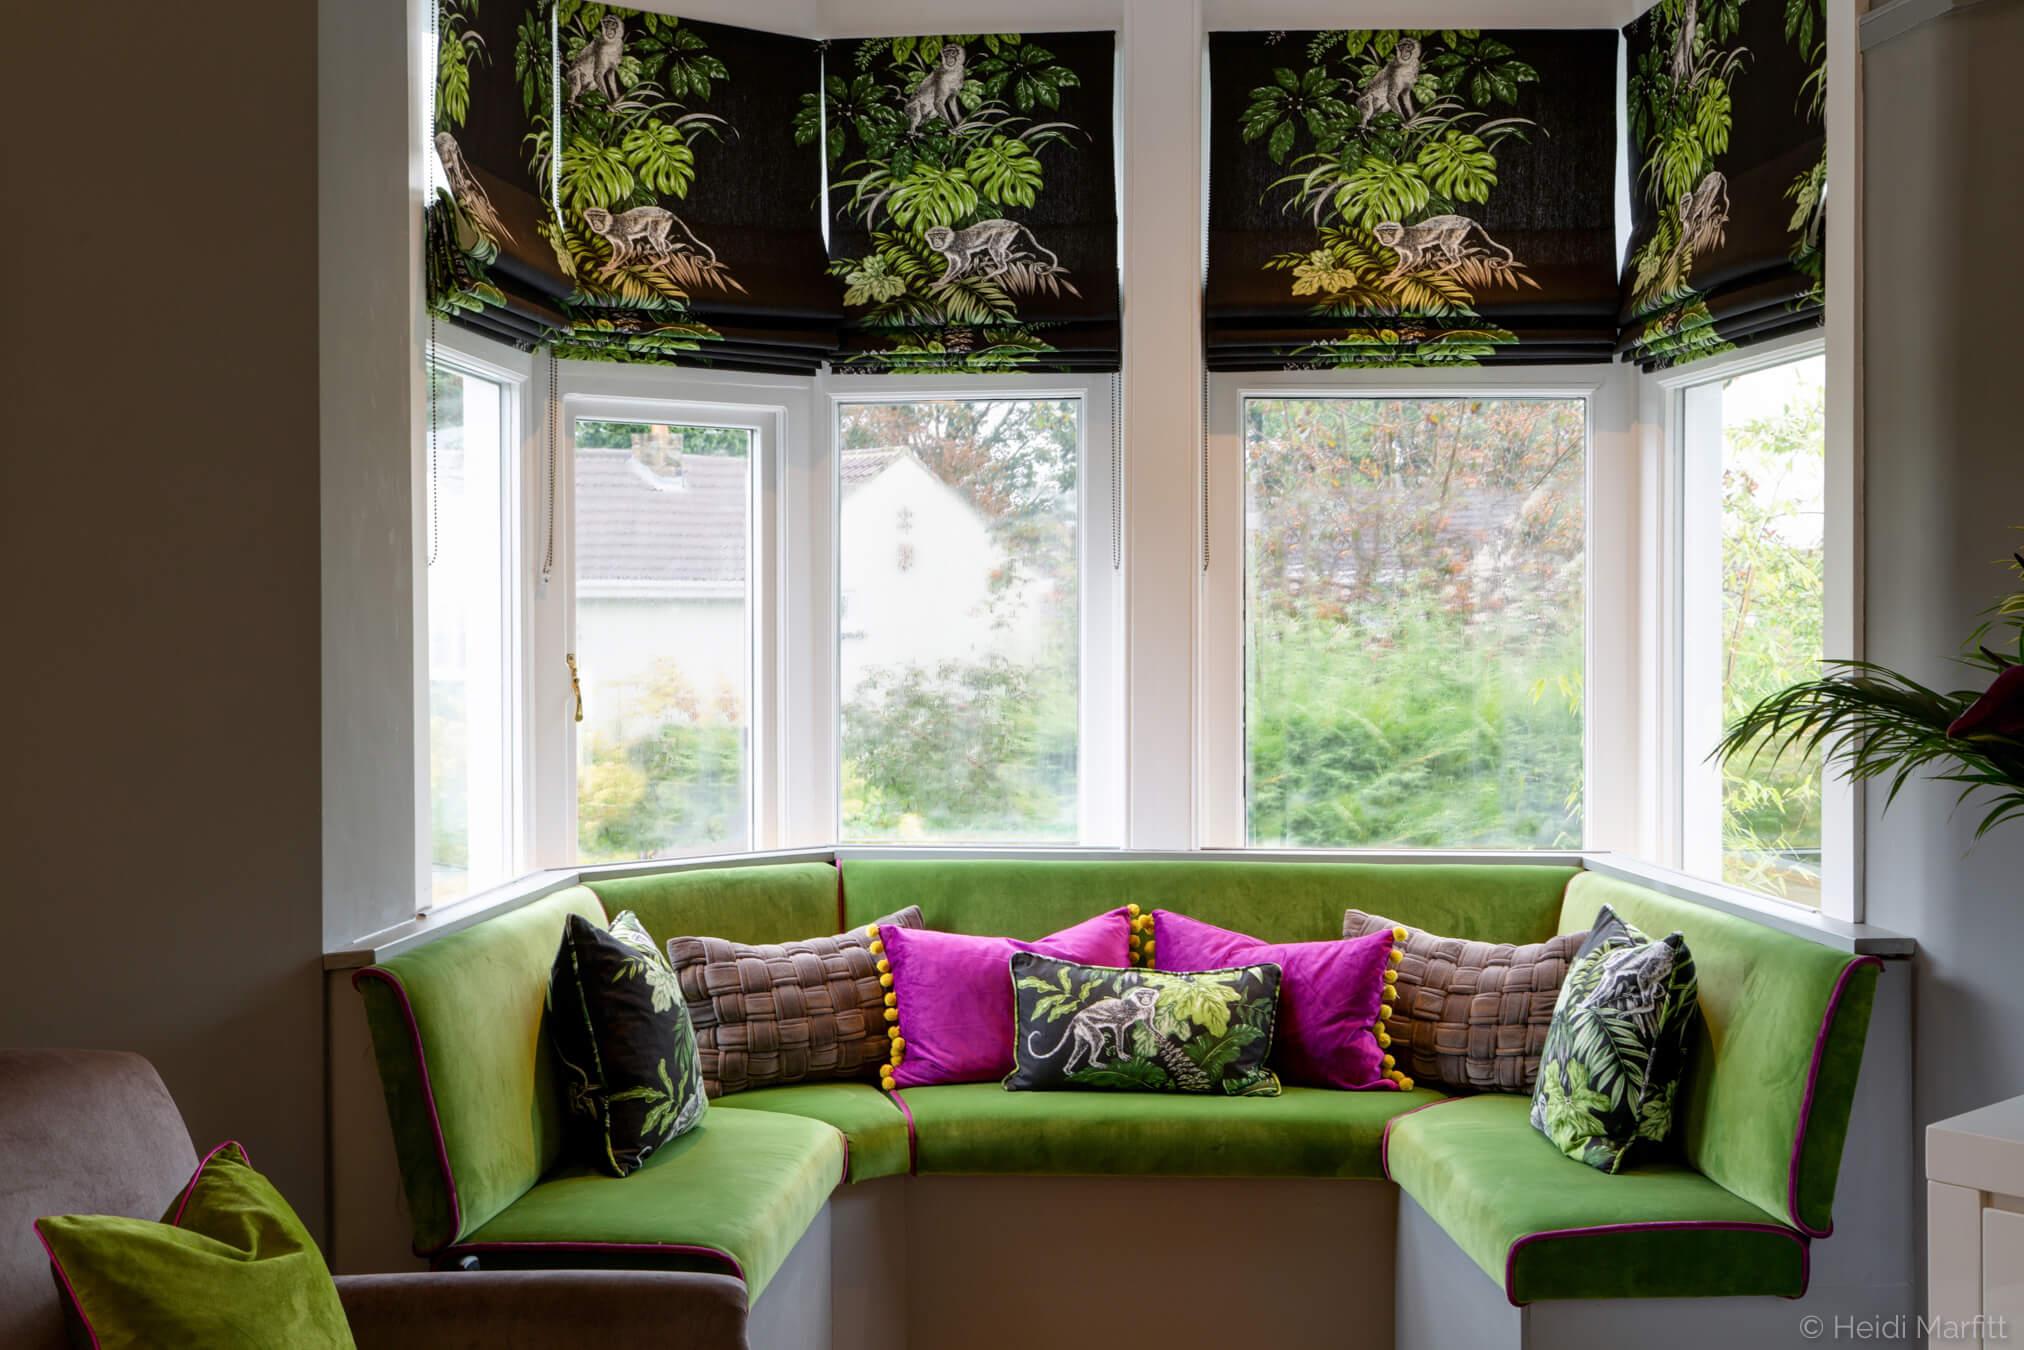 Fresh green velvet makes this window seat a perfect spot